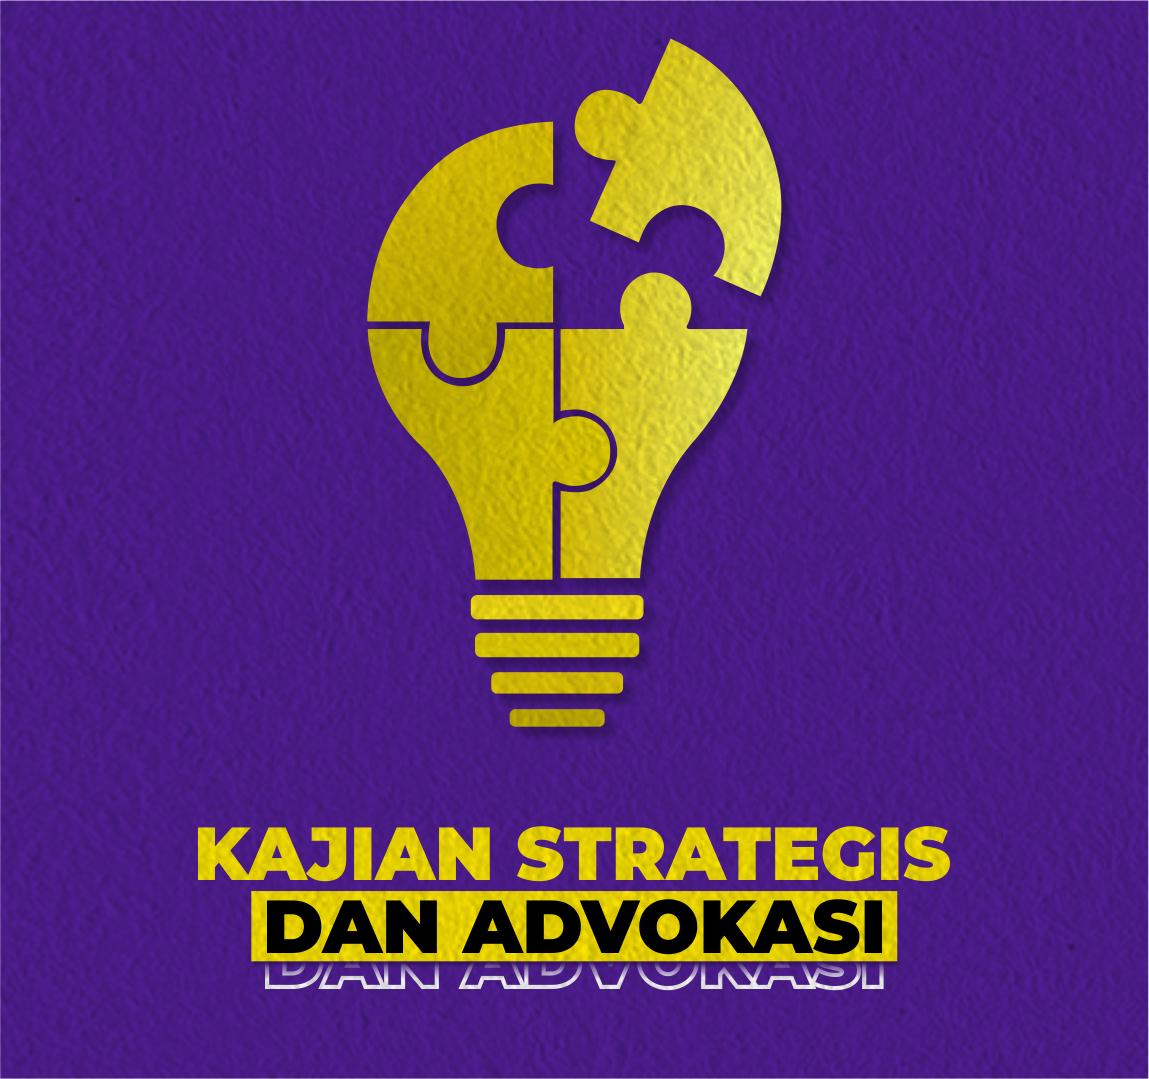 4. Kajian Strategis dan Advokasi